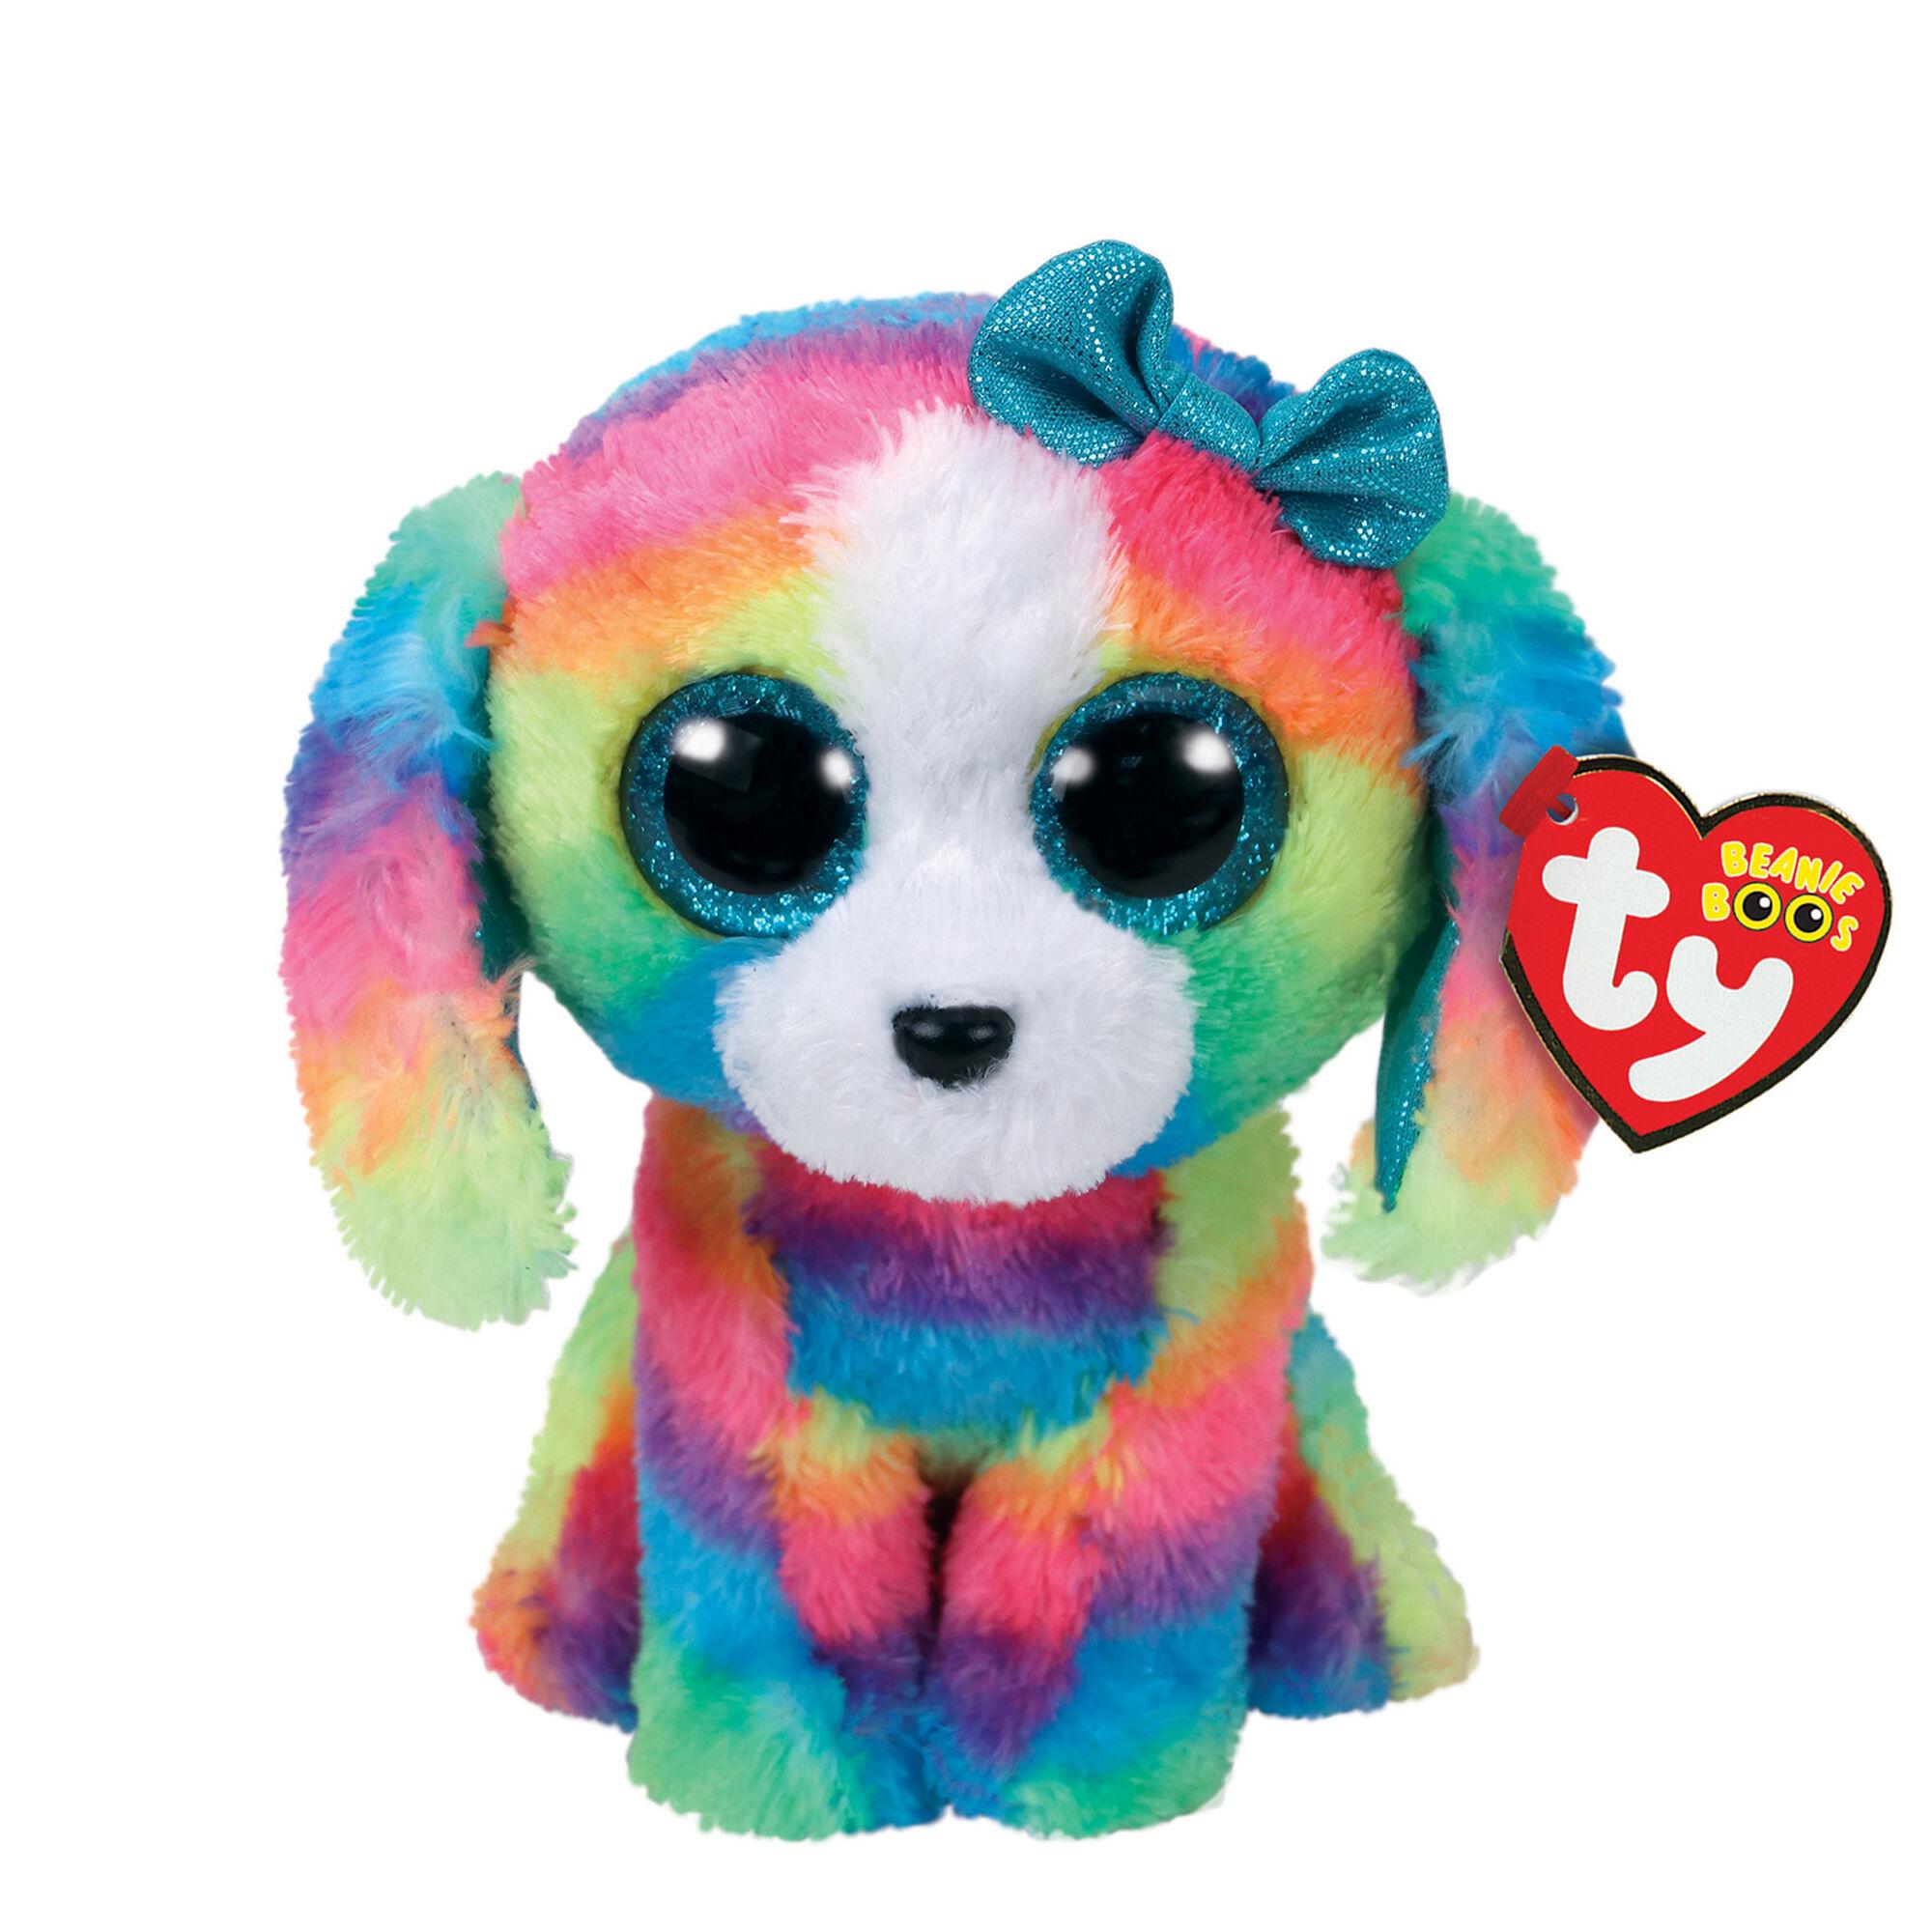 ... Ty Beanie Boo Small Lola the Dog Plush Toy 798311bac97